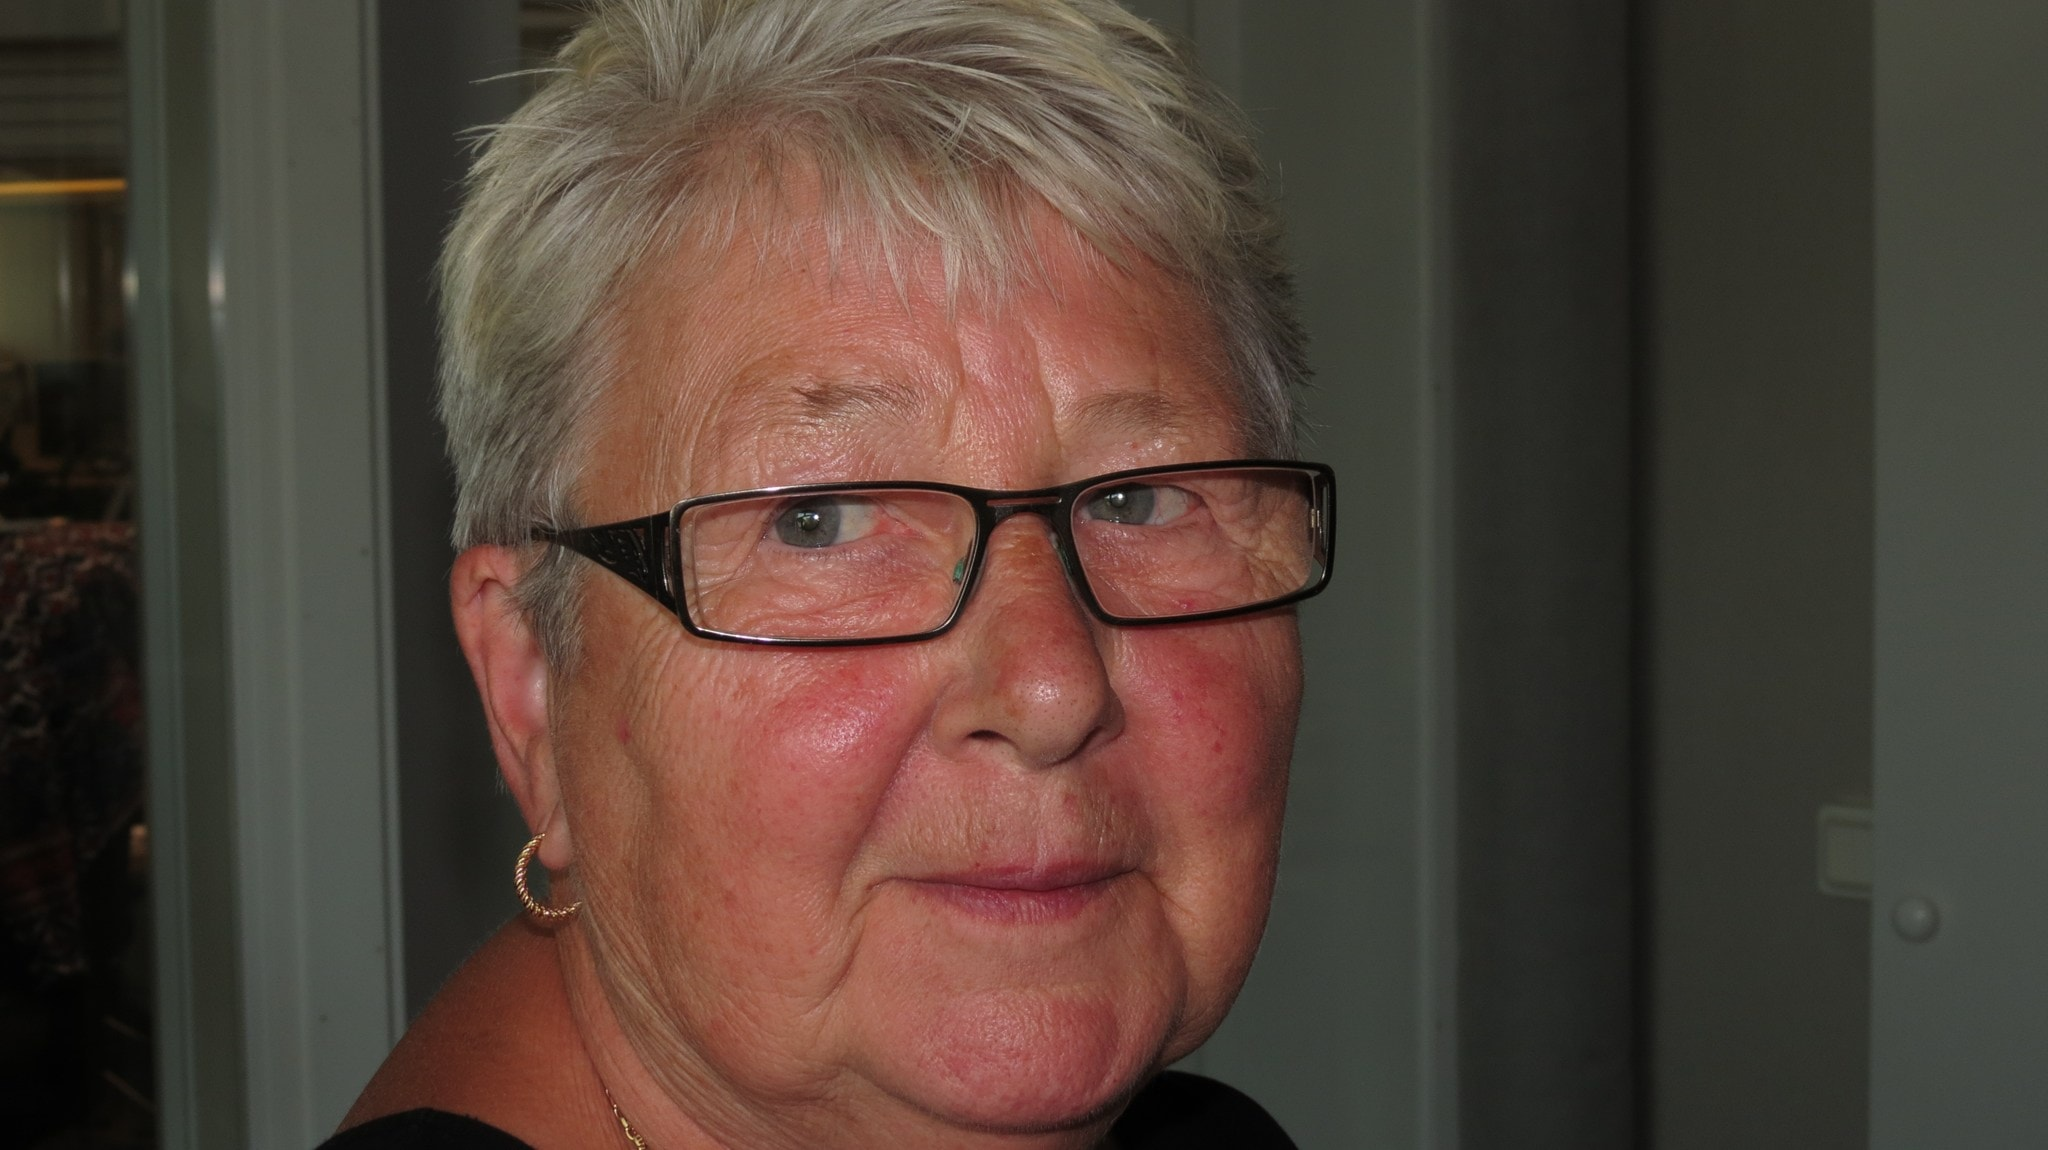 byrå ledsagare stort bröst i Stockholm